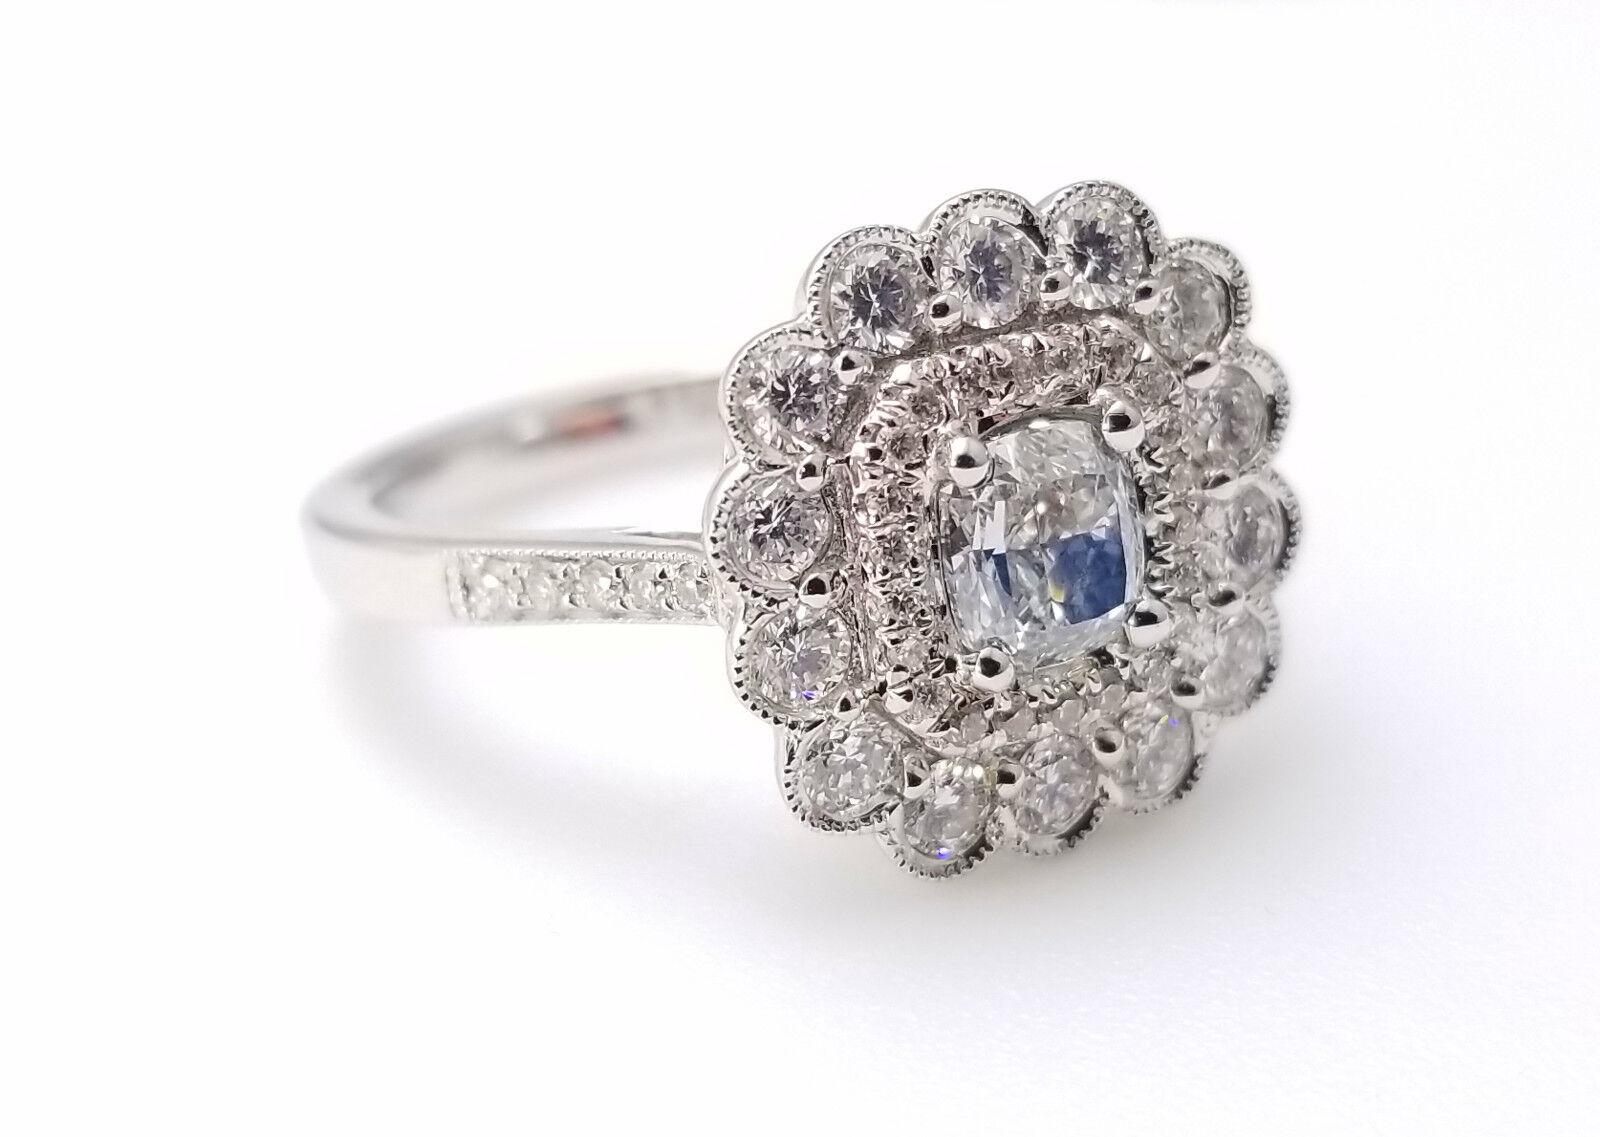 1.03ct Faint Blue Diamond Engagement Ring GIA Cushion Hallo 18K White Gold VS1 1